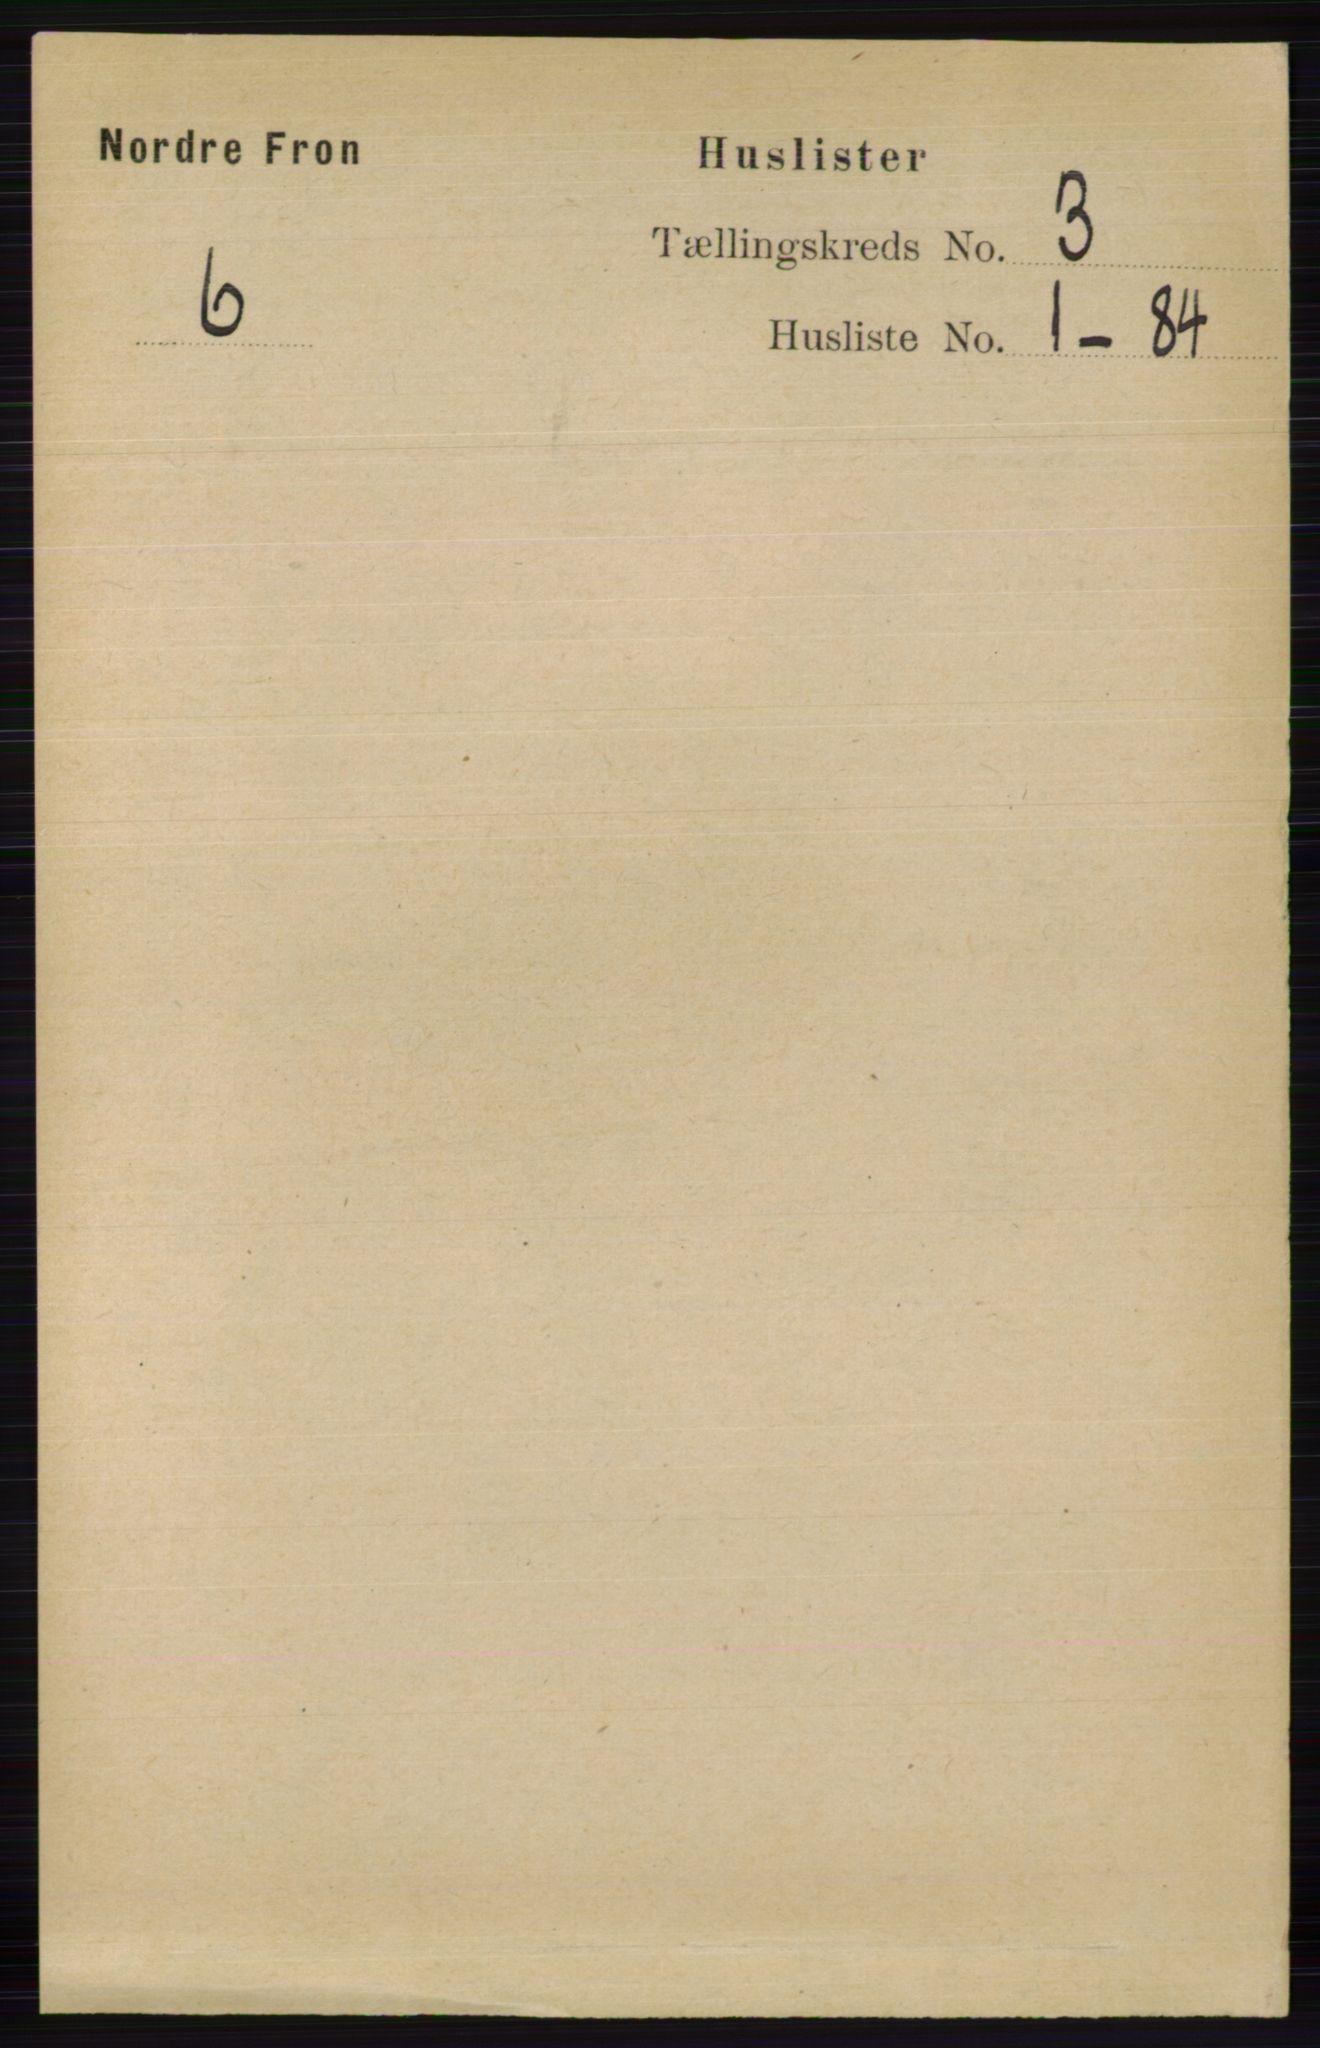 RA, Folketelling 1891 for 0518 Nord-Fron herred, 1891, s. 756